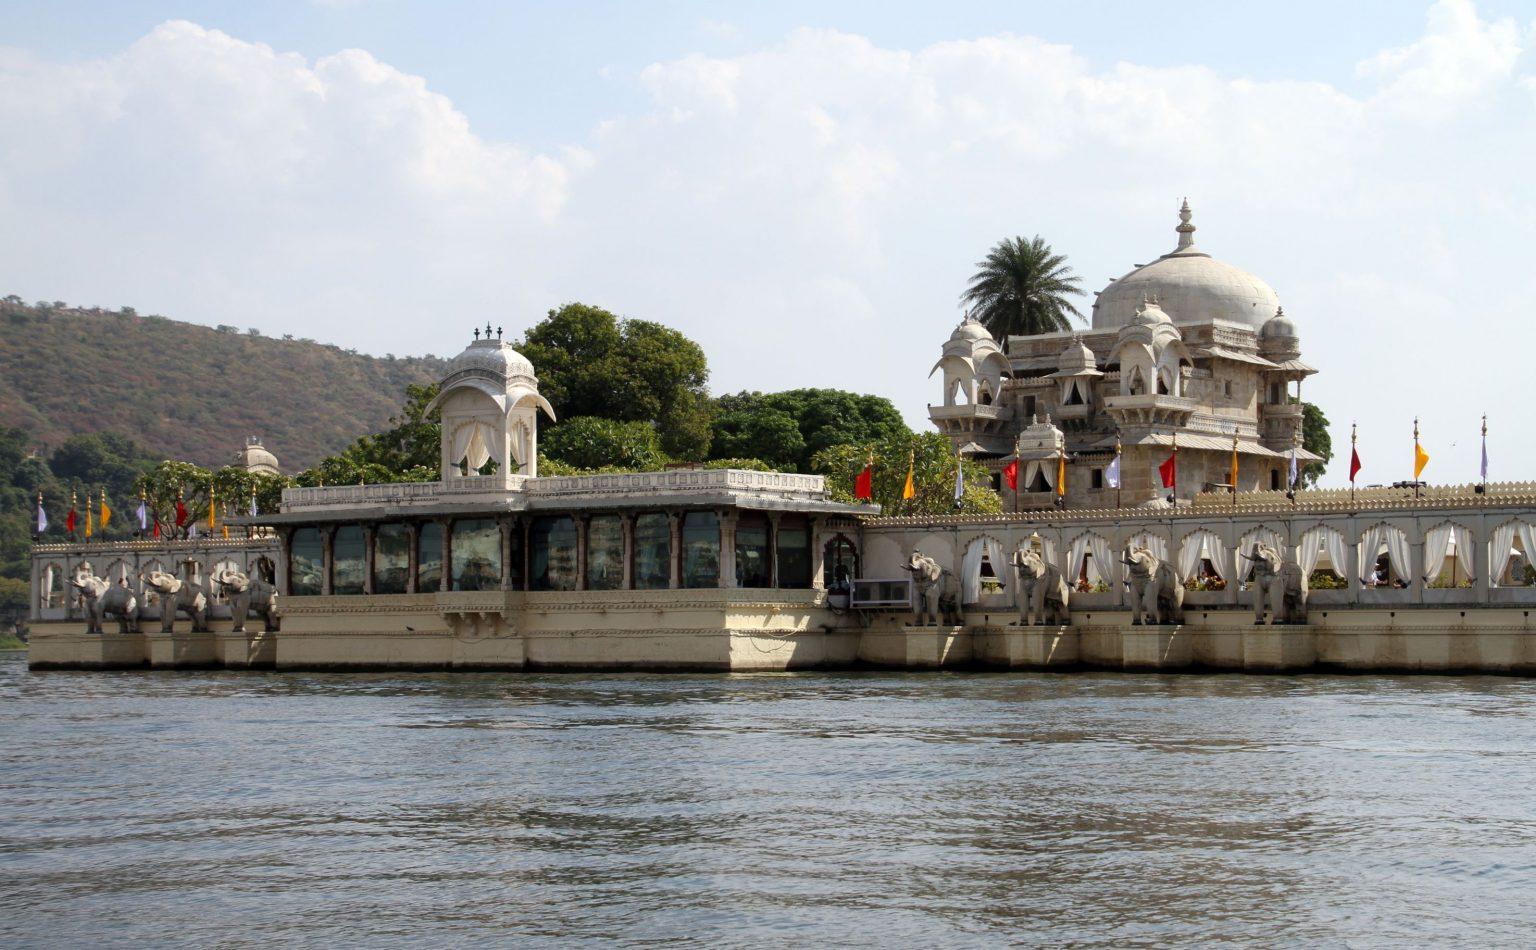 Jagmandir Palace Udaipur Rajasthan